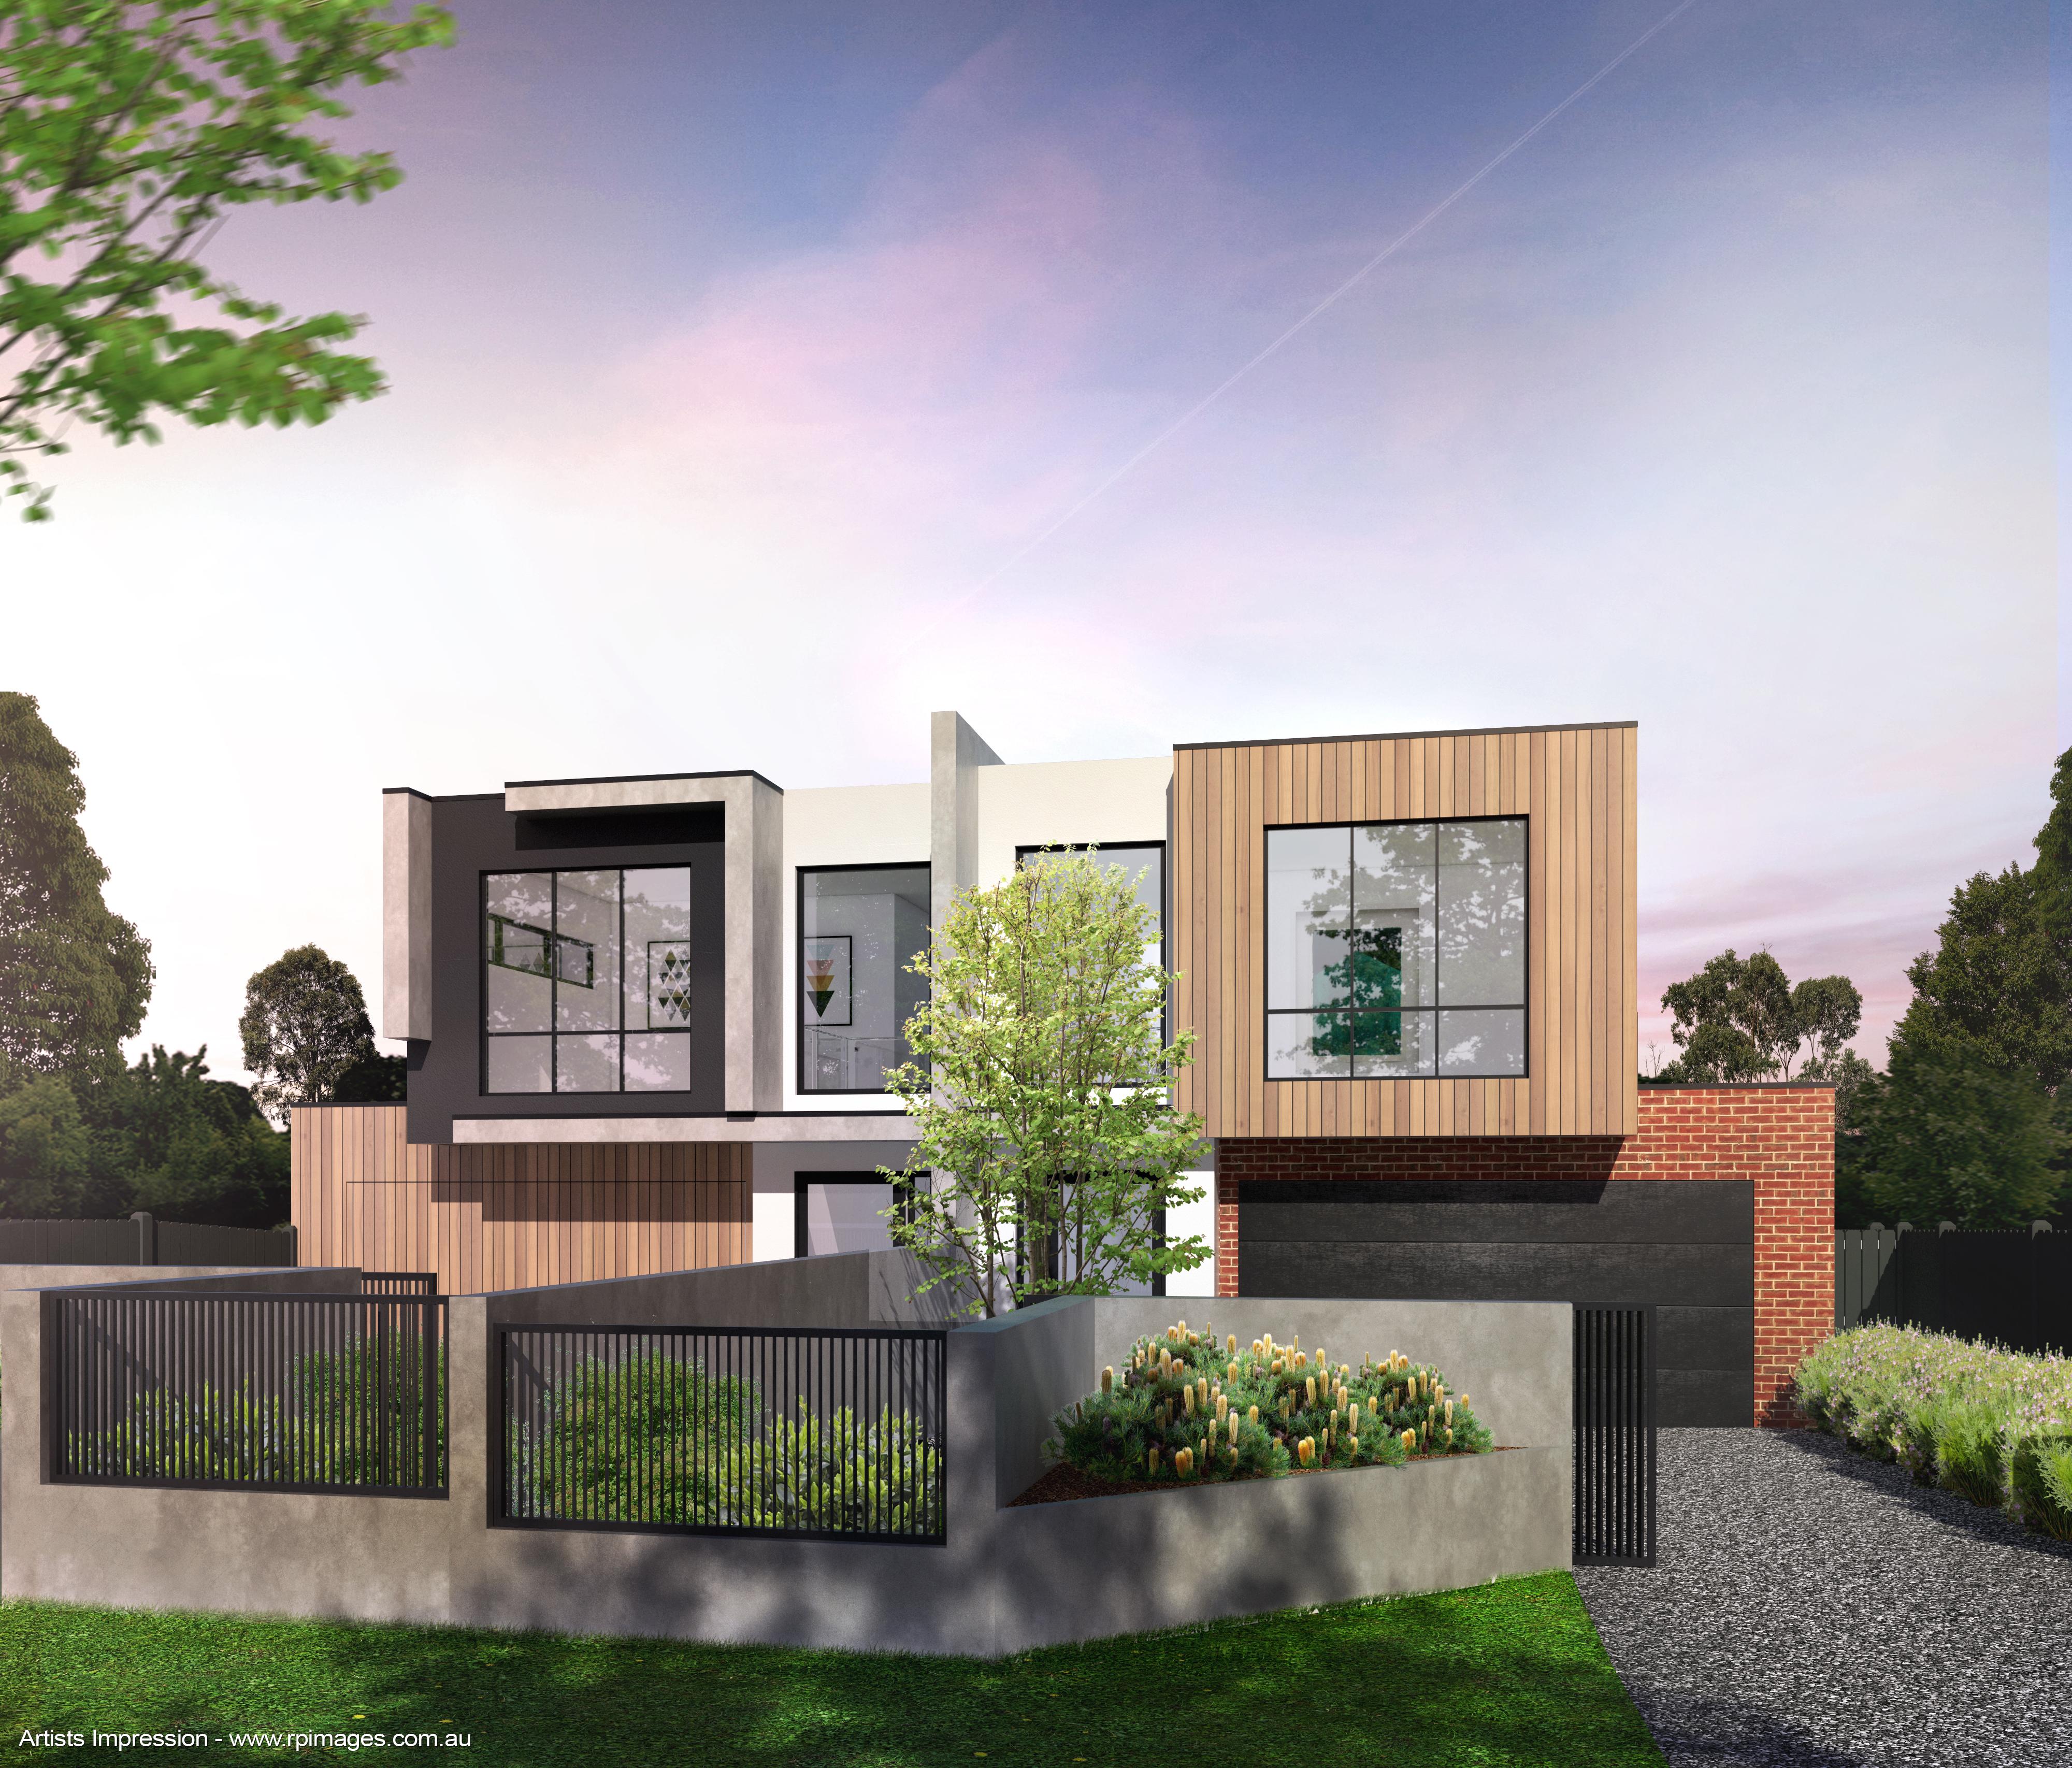 1-9 Portrush Grove Mornington Exterior -